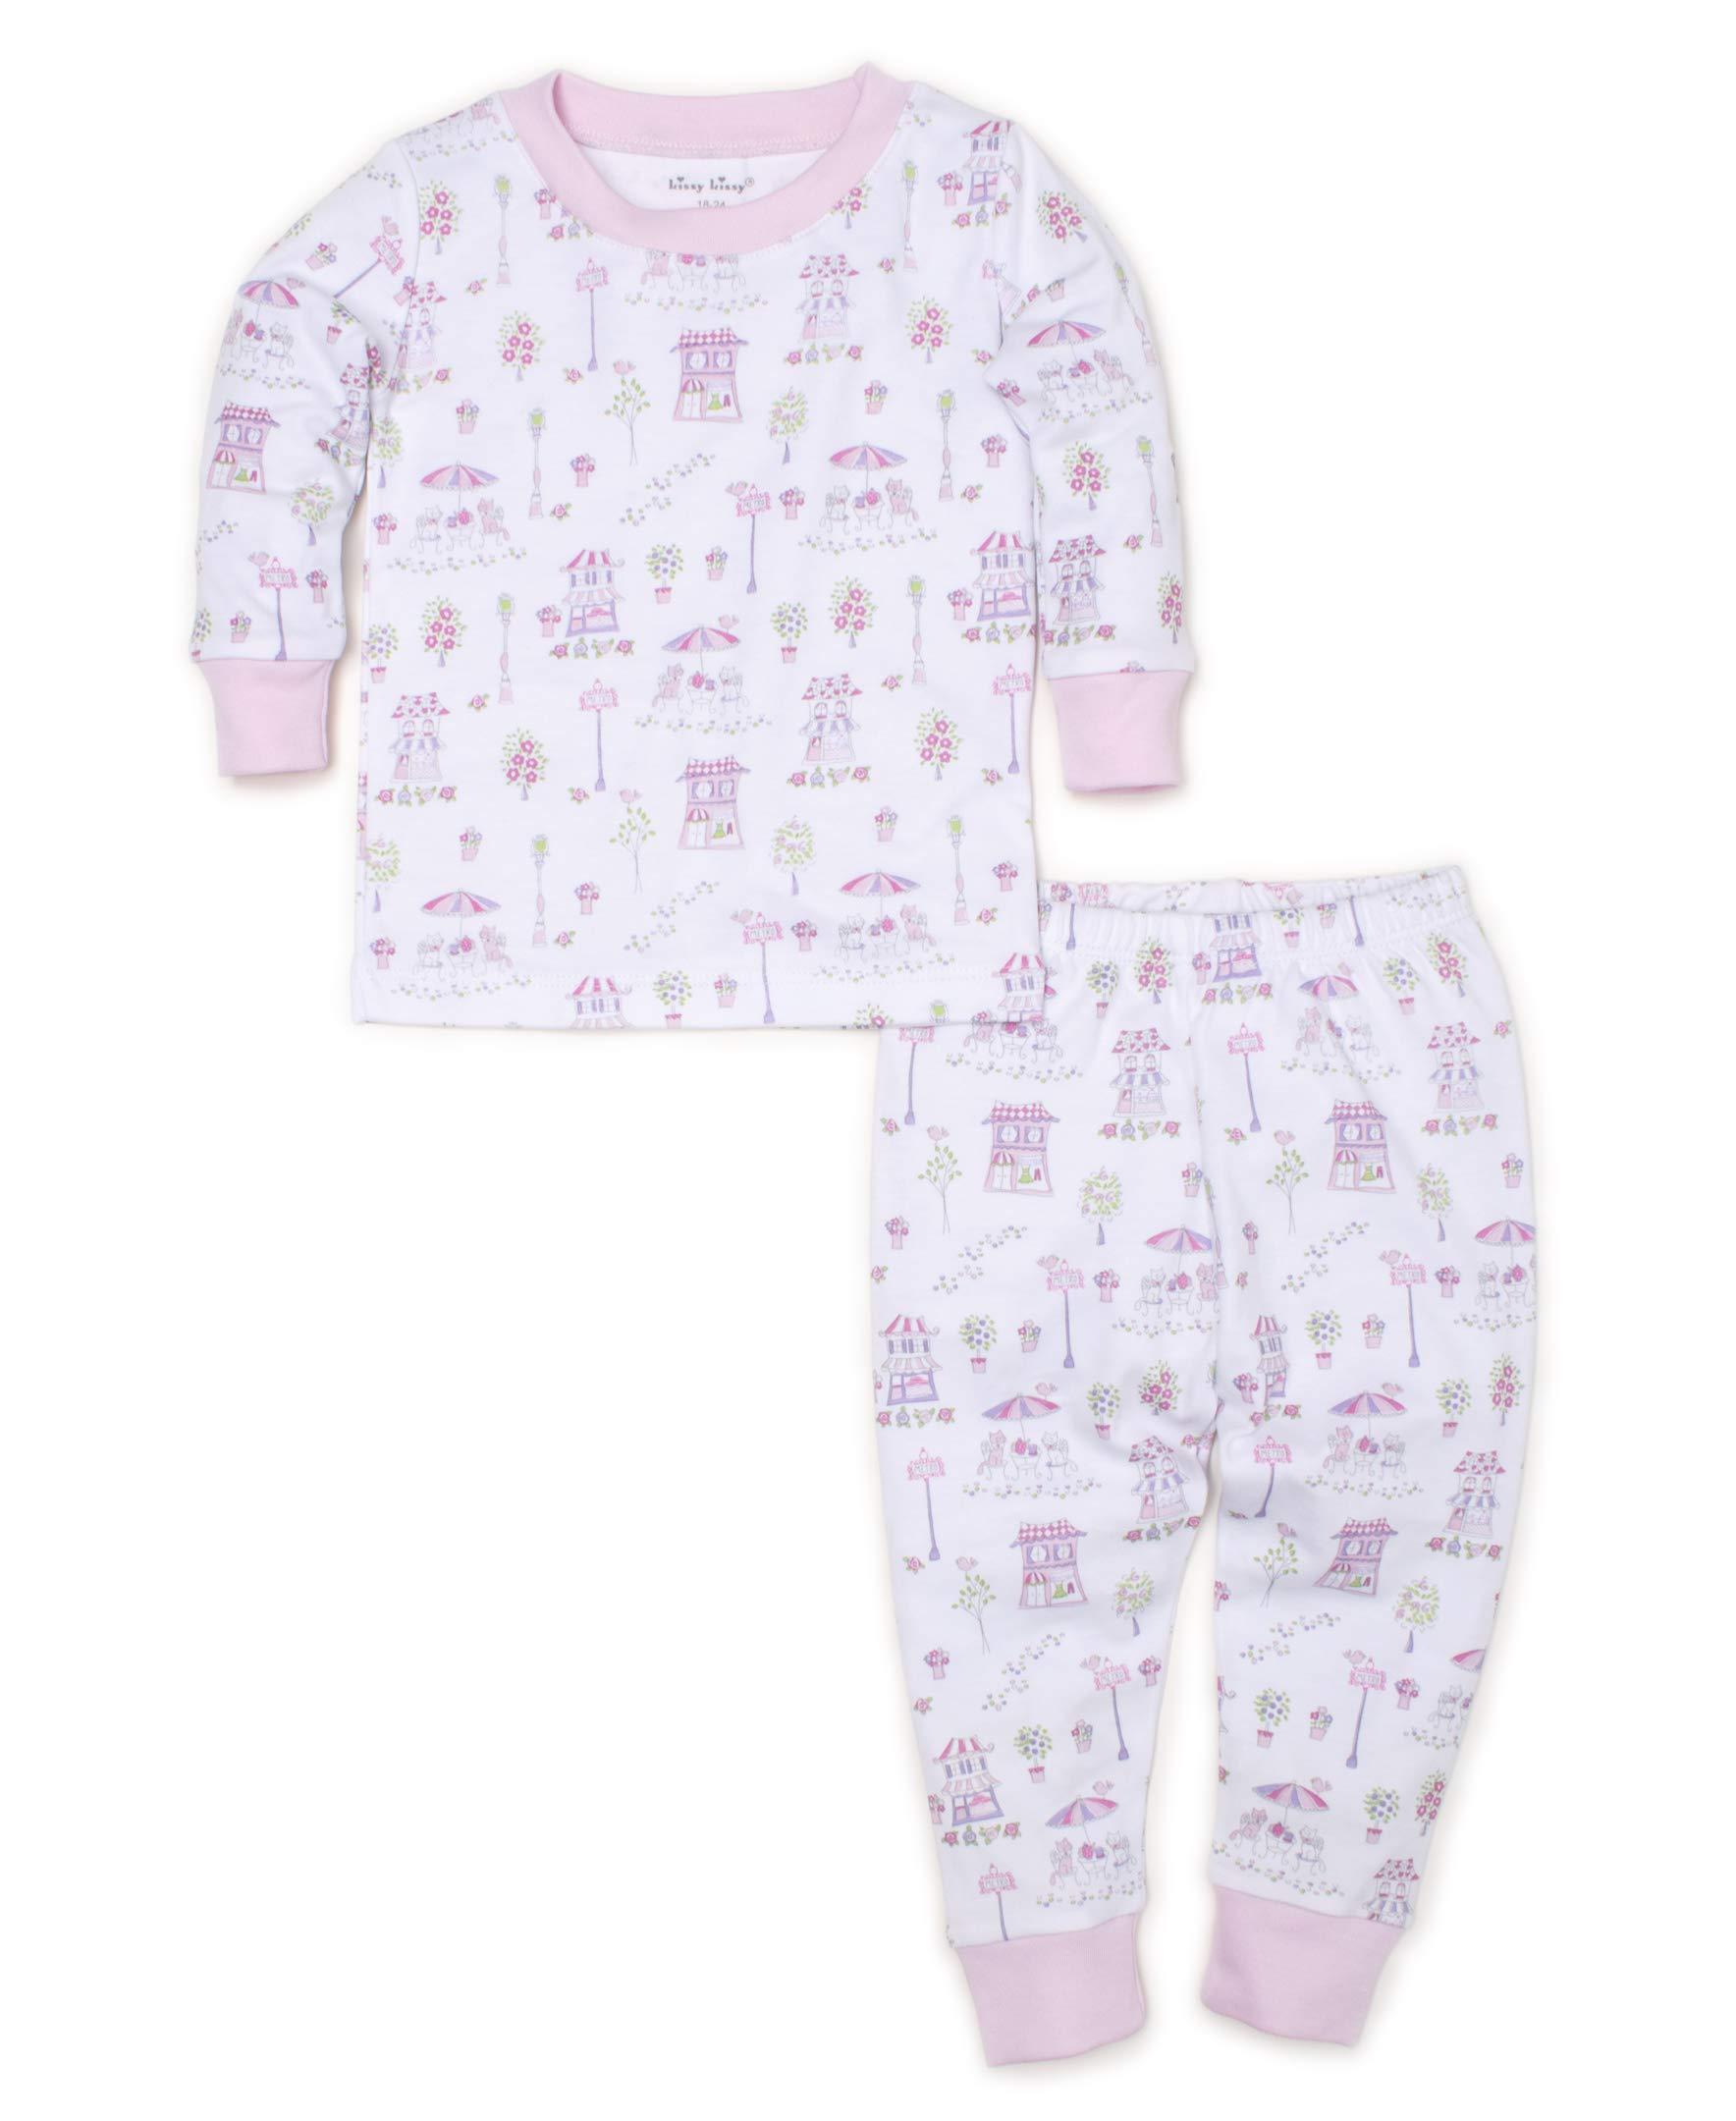 Kissy Kissy Baby-Girls Infant Parisian Promenade Print Long Pajamas Set-Pink-18-24 Months by Kissy Kissy